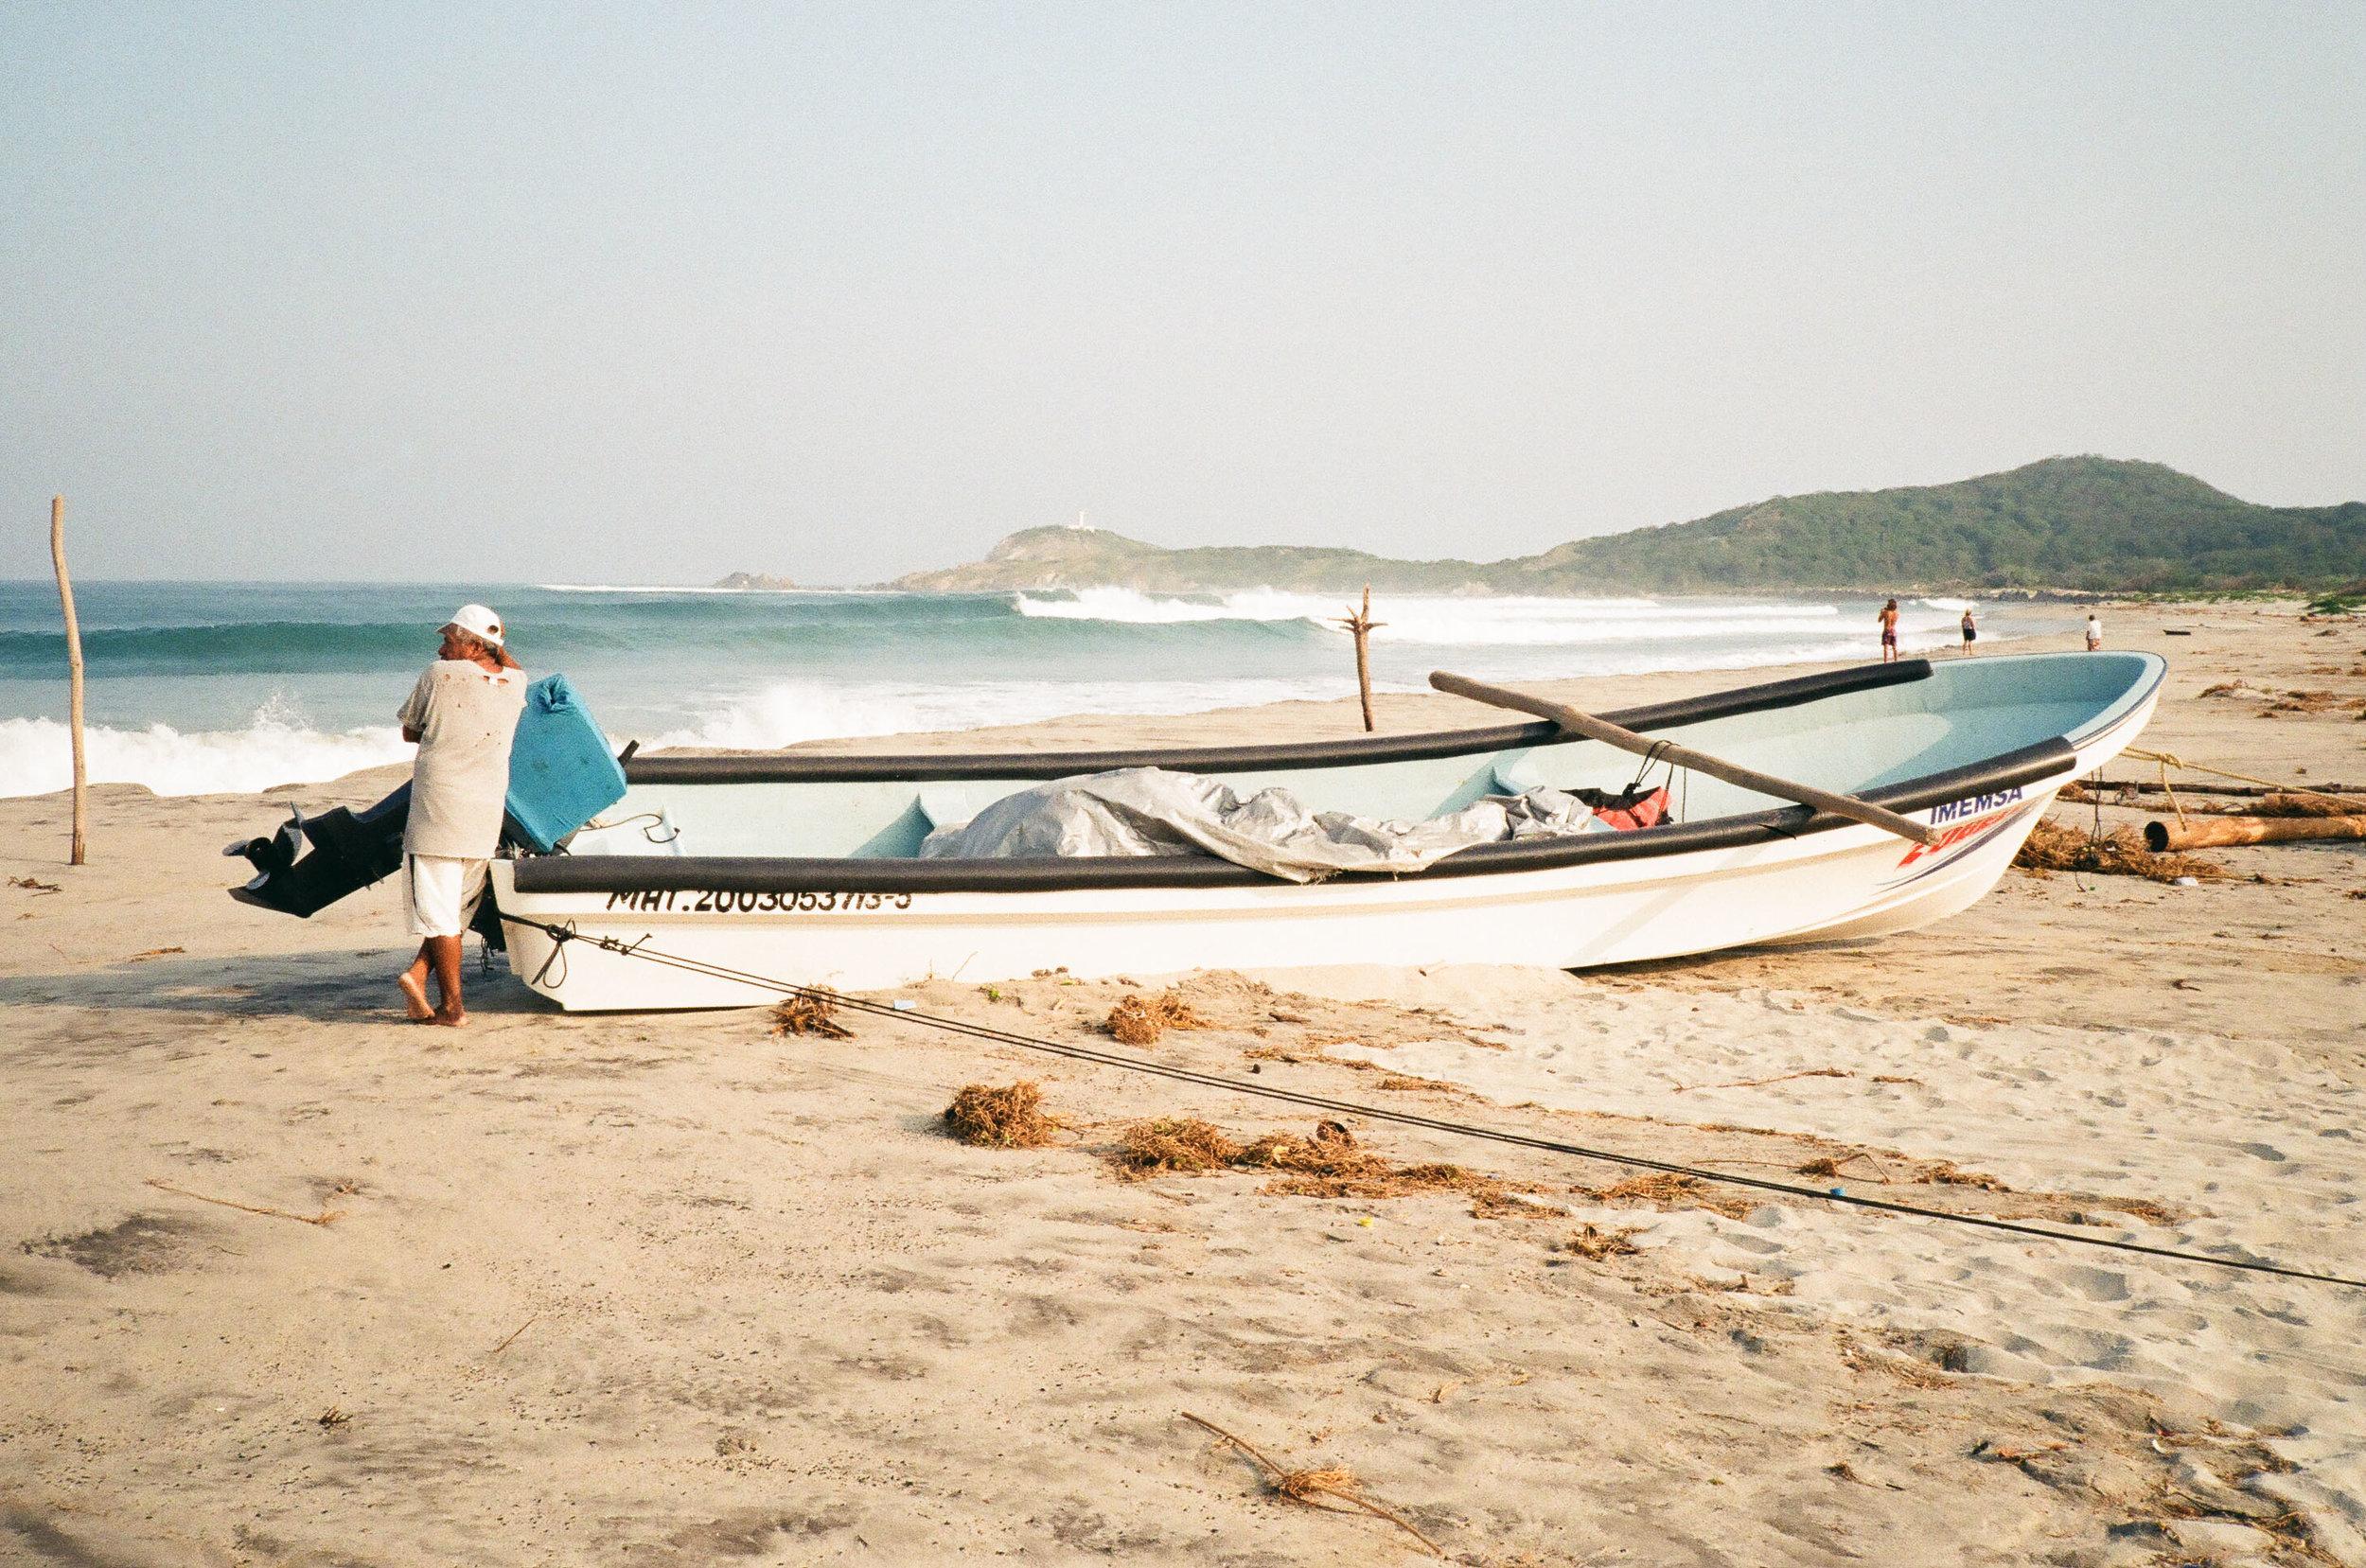 captainbarto-blog-adambartoshesky-model-nautica-client-mexico-surf-trip-mexican-mirage-september-2018-1944.jpg